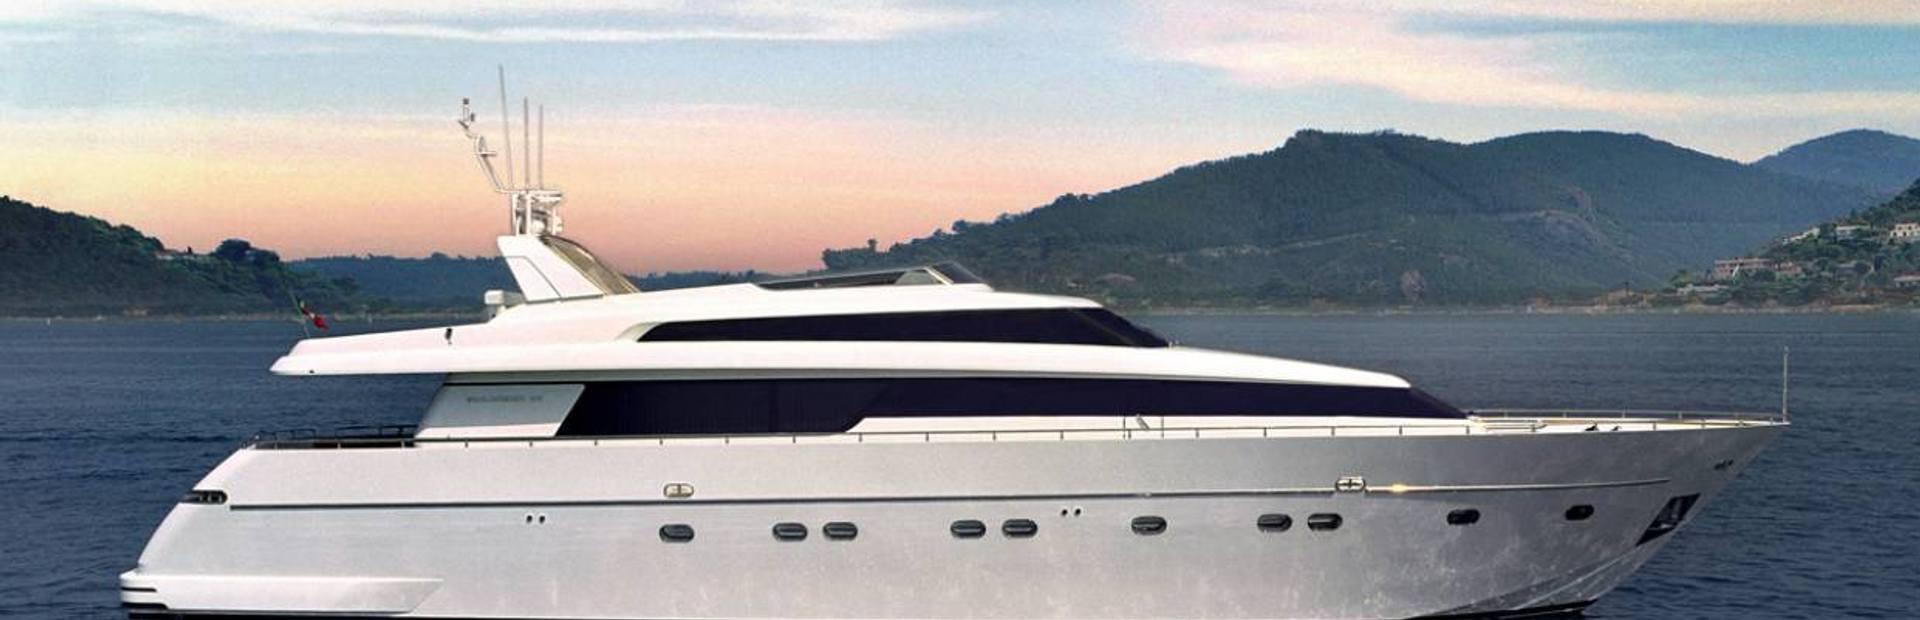 SL88 Yacht Charter